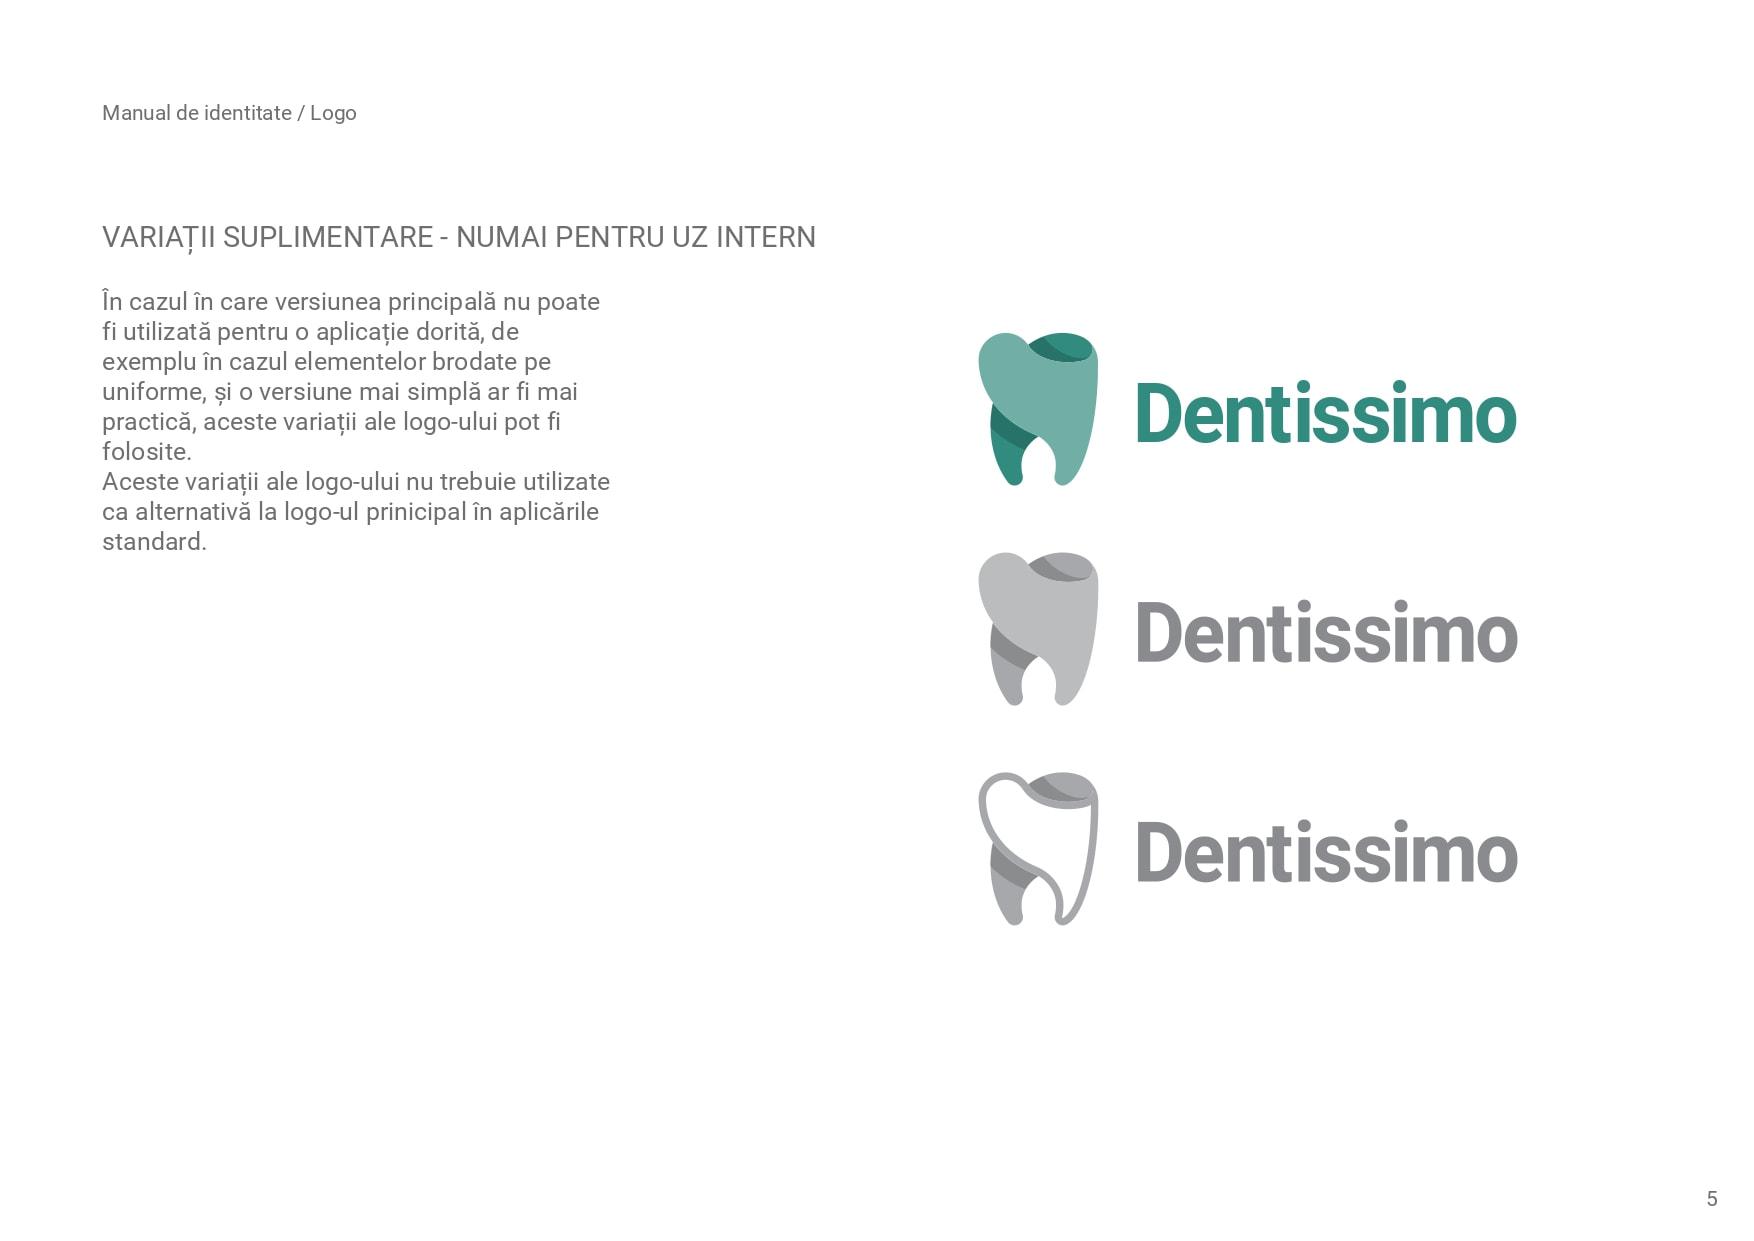 creare logo Dentissimo